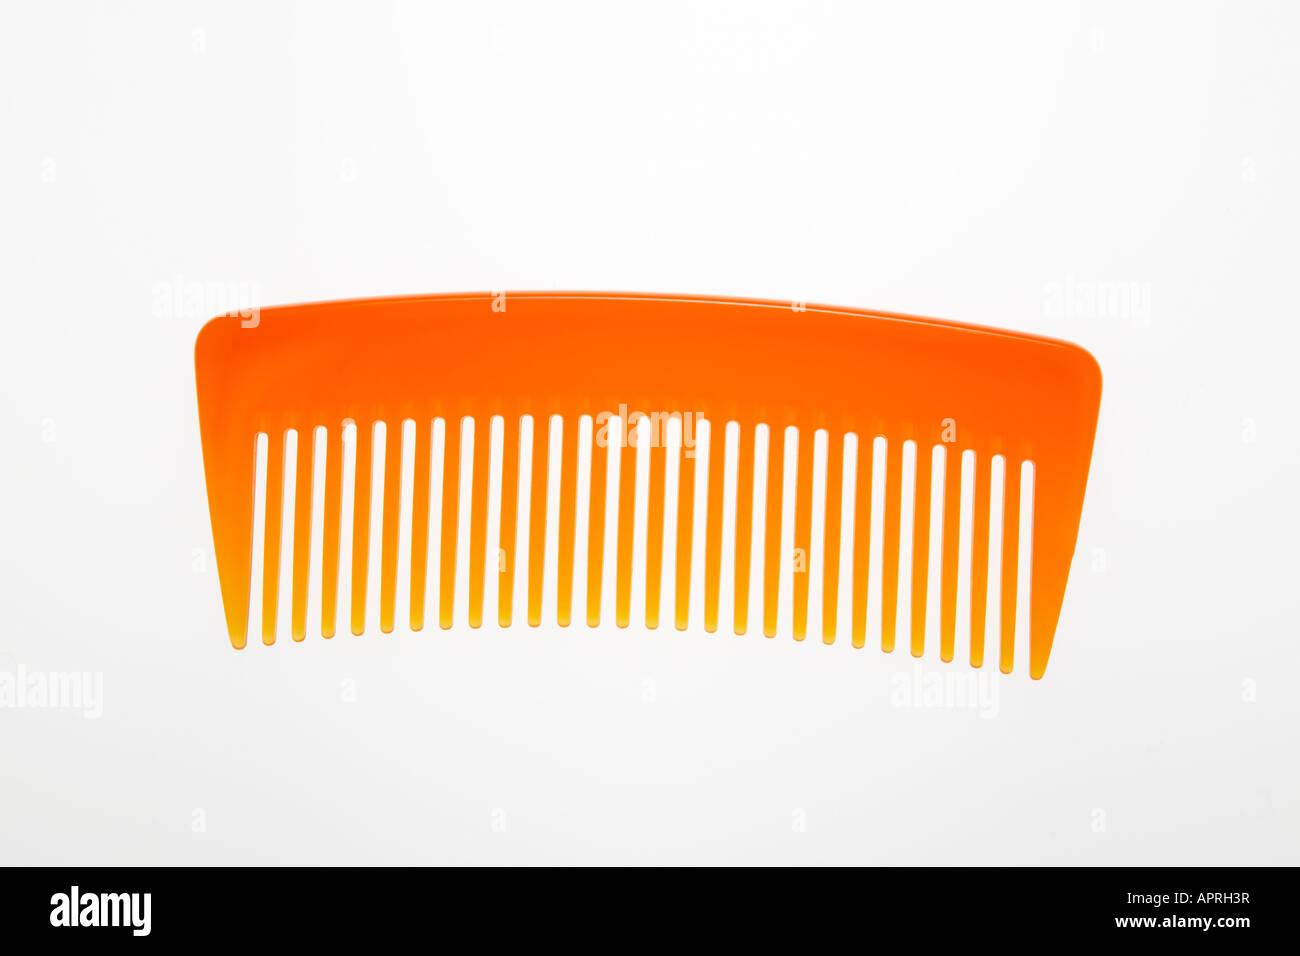 Plastic comb - Stock Image